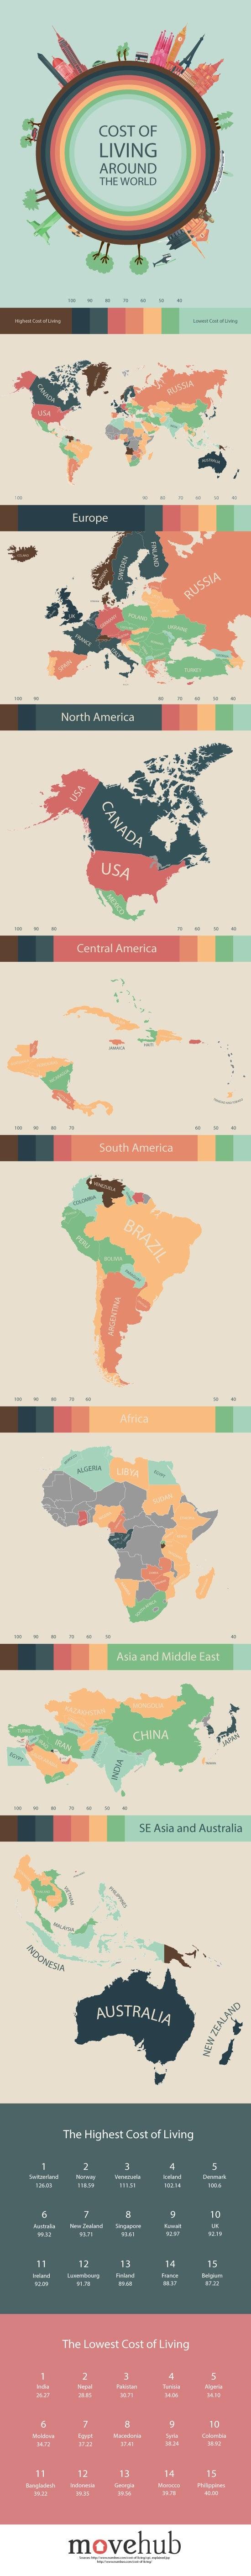 cost-of-living-around-world-infographic